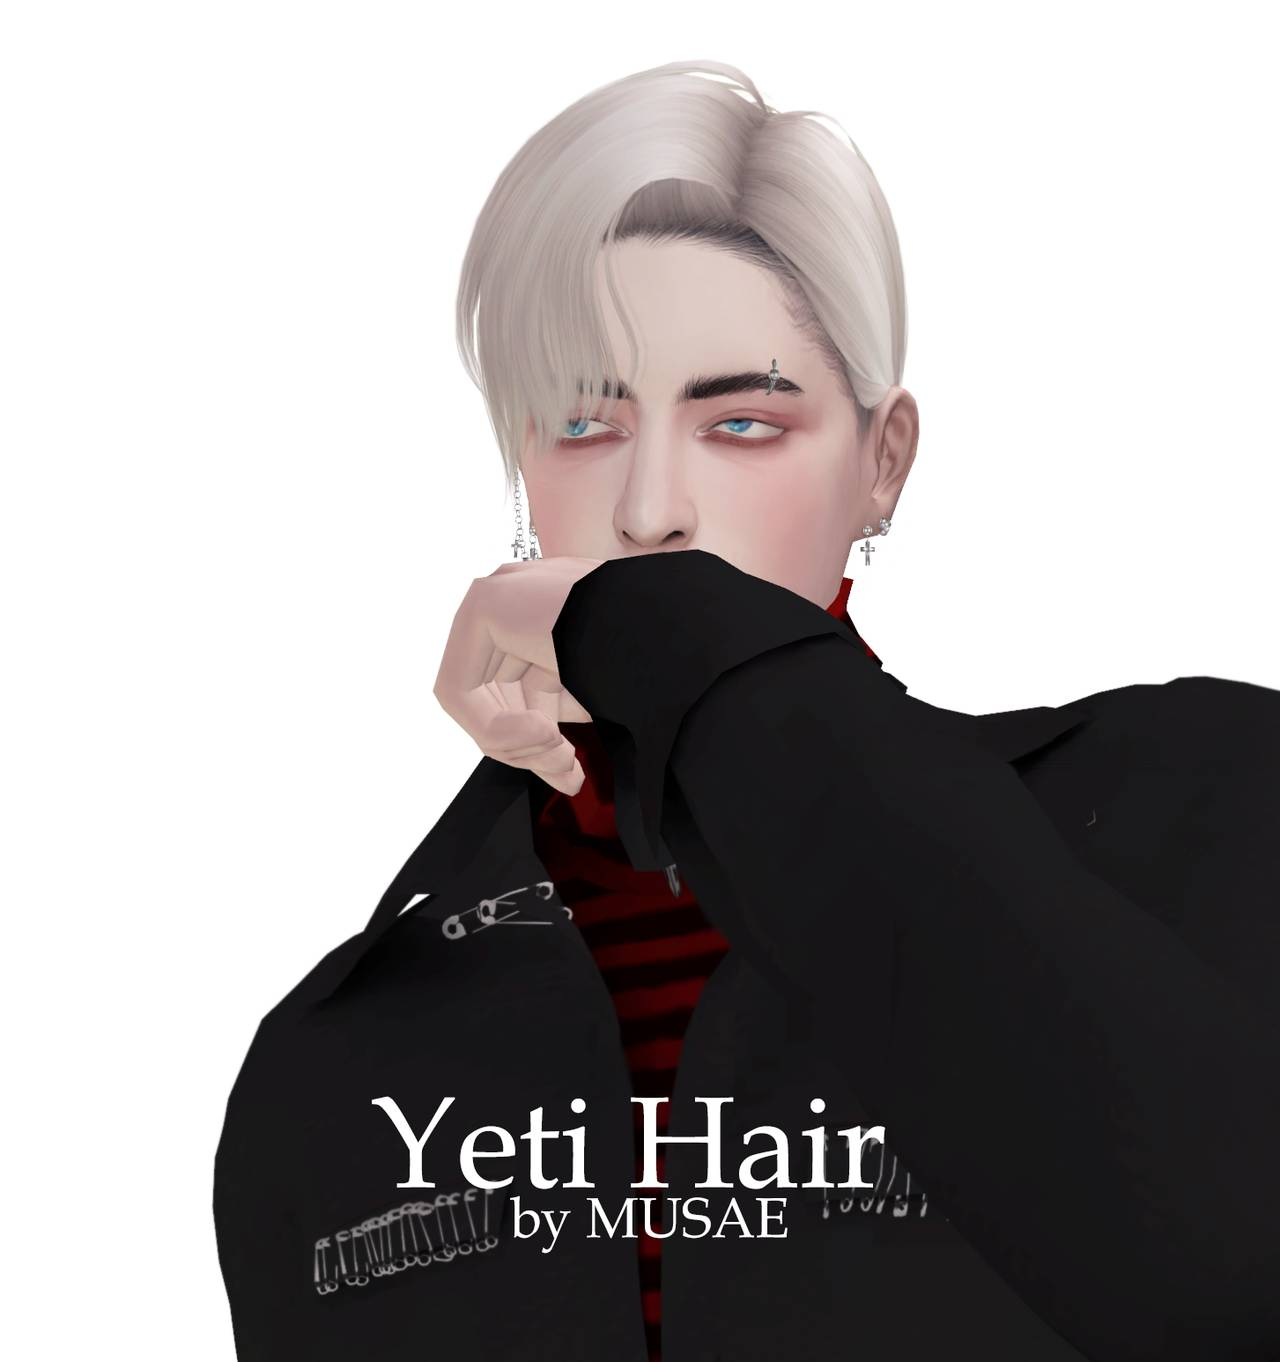 Мужская прическа - Yeti Hair